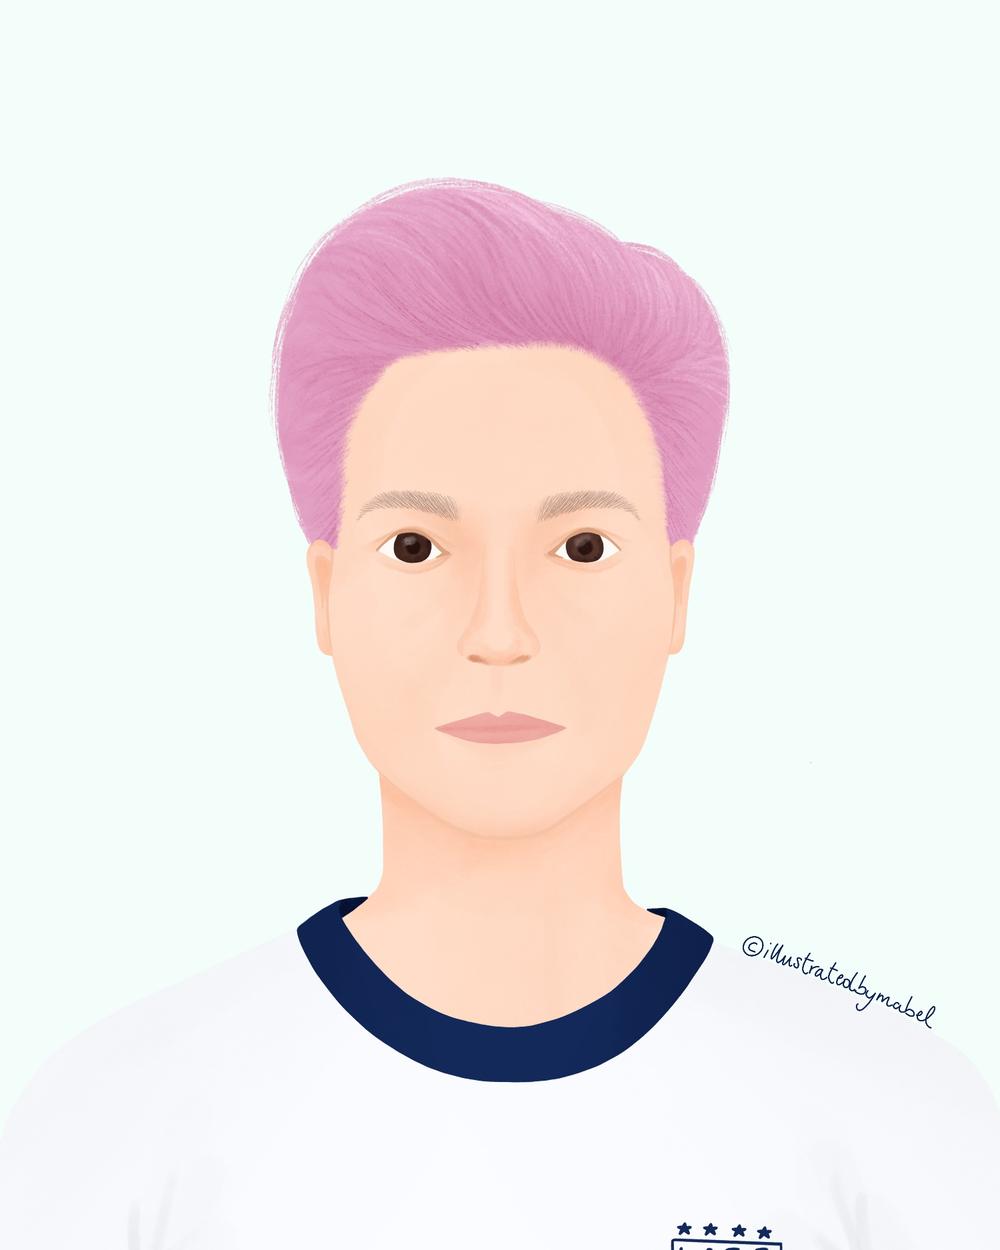 Woman portrait illustration Megan Rapinoe